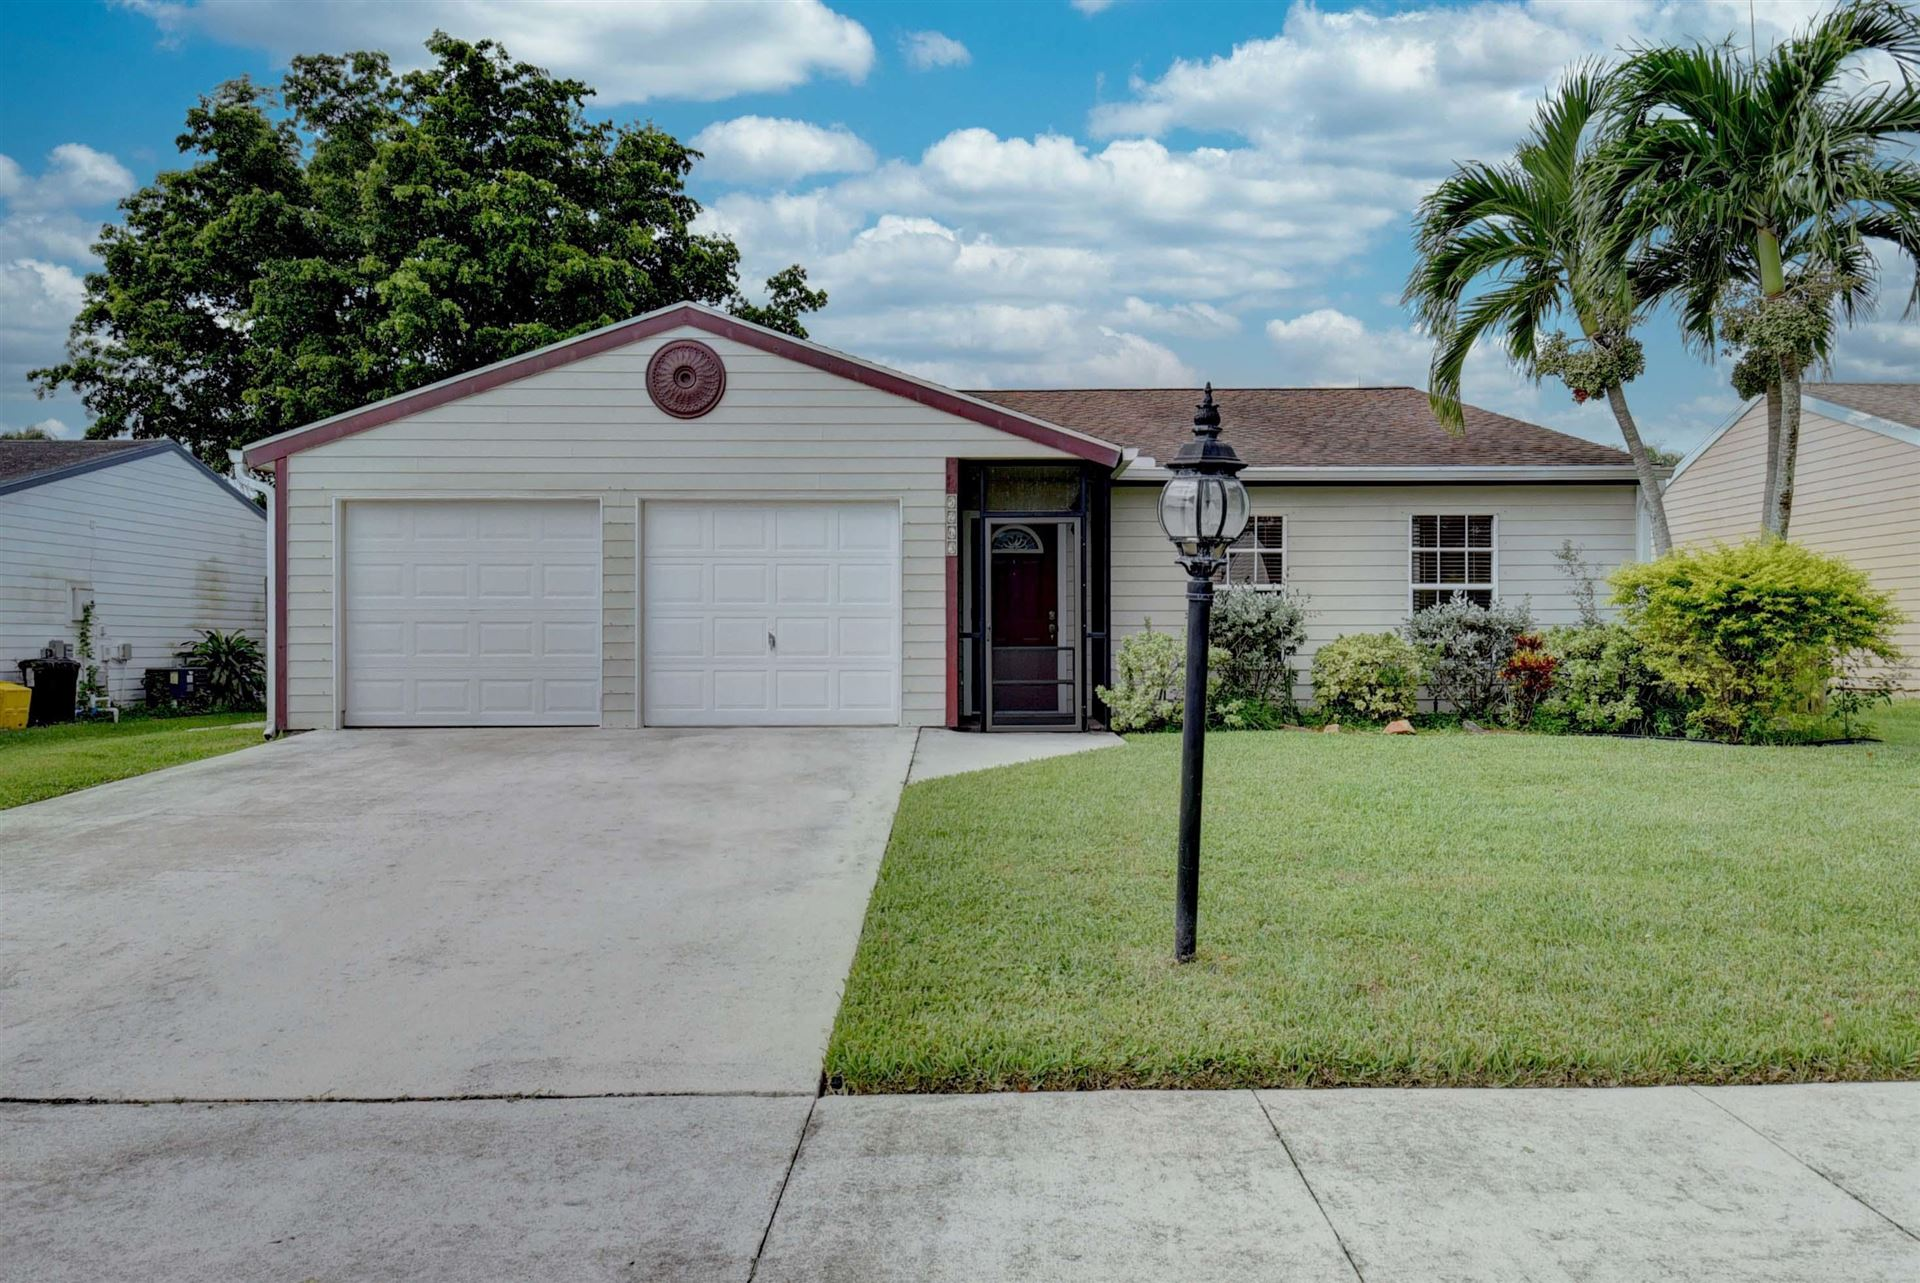 5263 Edgewood Drive, Lake Worth, FL 33467 - #: RX-10665627